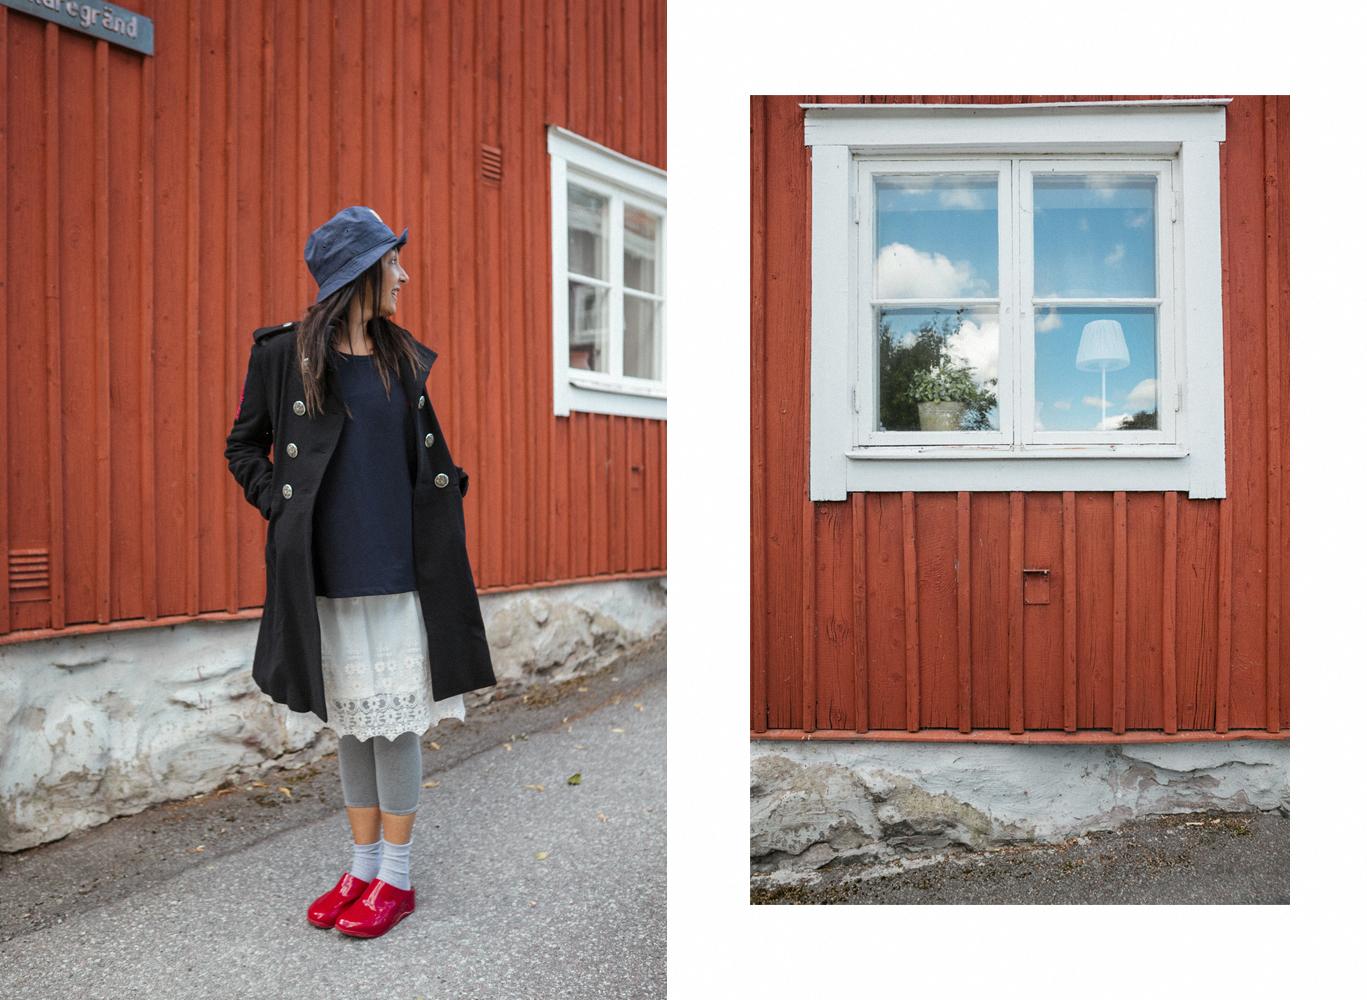 smilingischic-sandra-bacci-outfit-sweden-sigtuna-9722